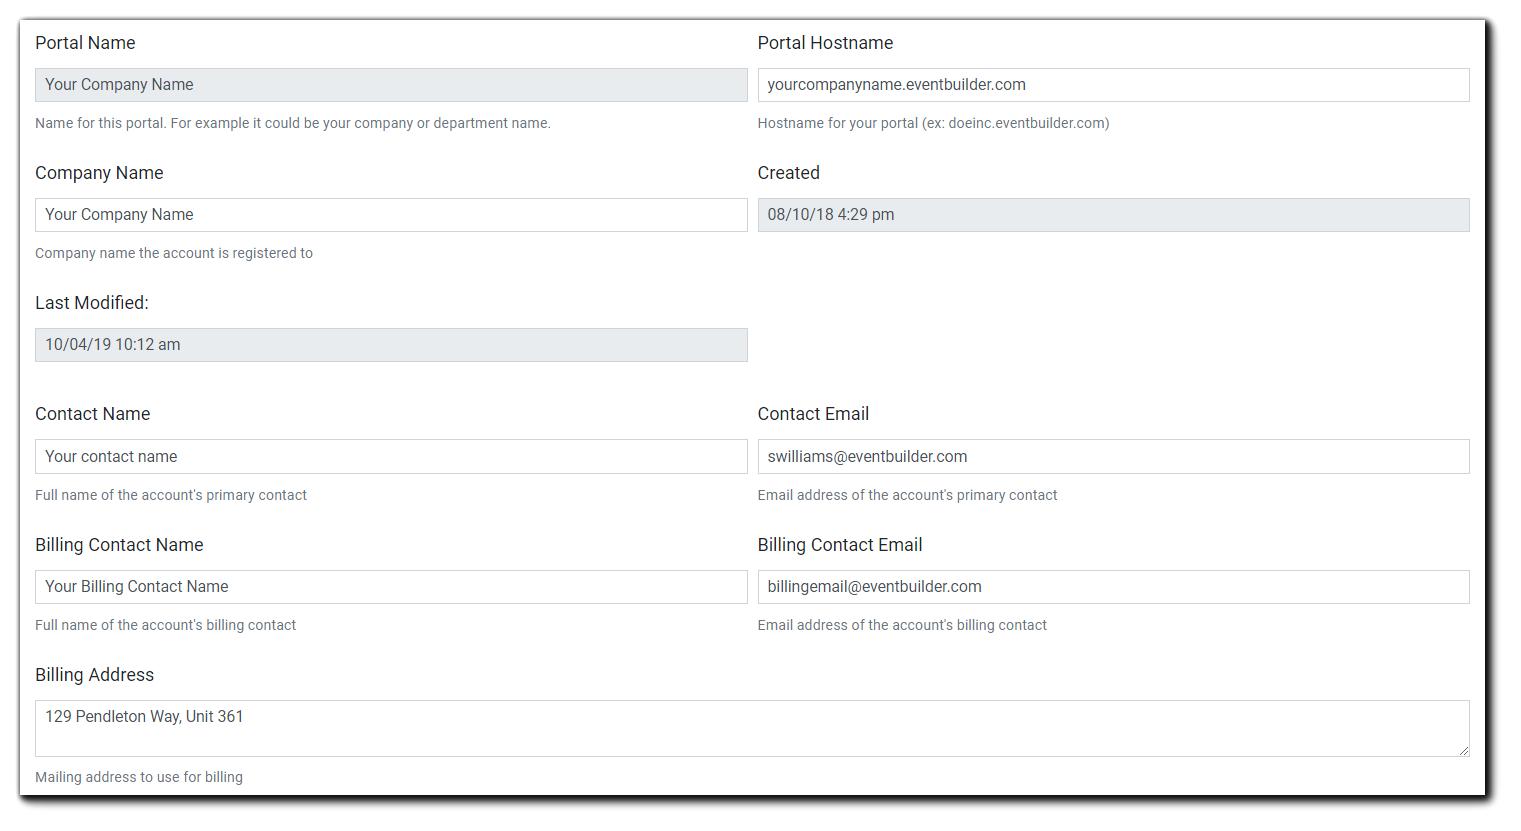 Screenshot: General section of Portal Configuration.